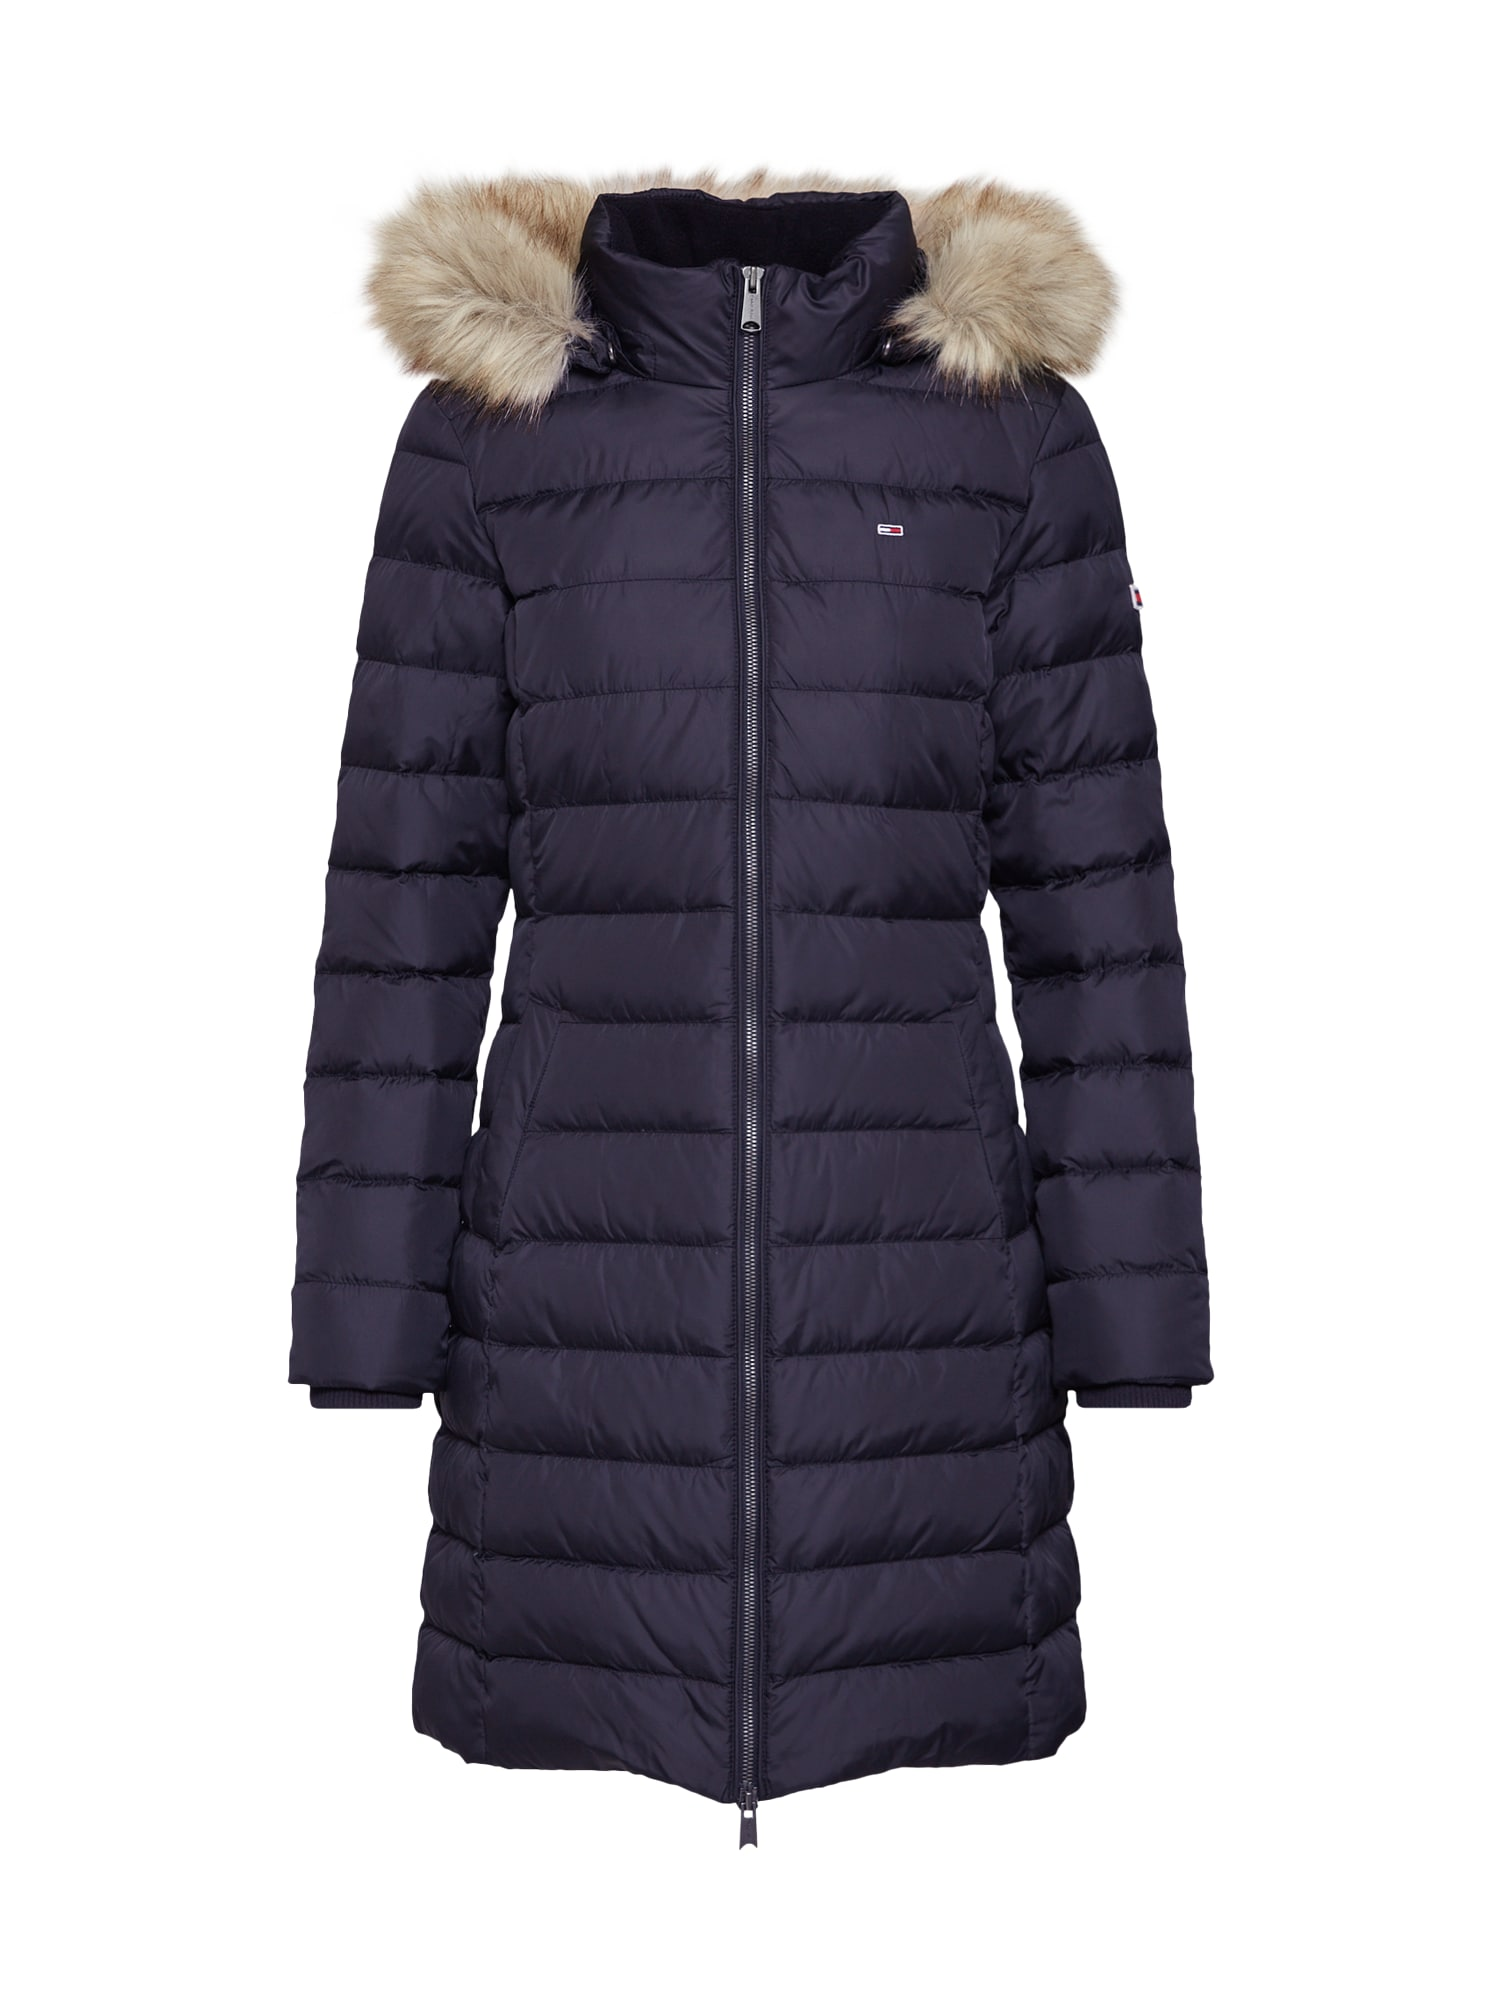 Zimní kabát TJW ESSENTIAL HOODED DOWN COAT černá Tommy Jeans